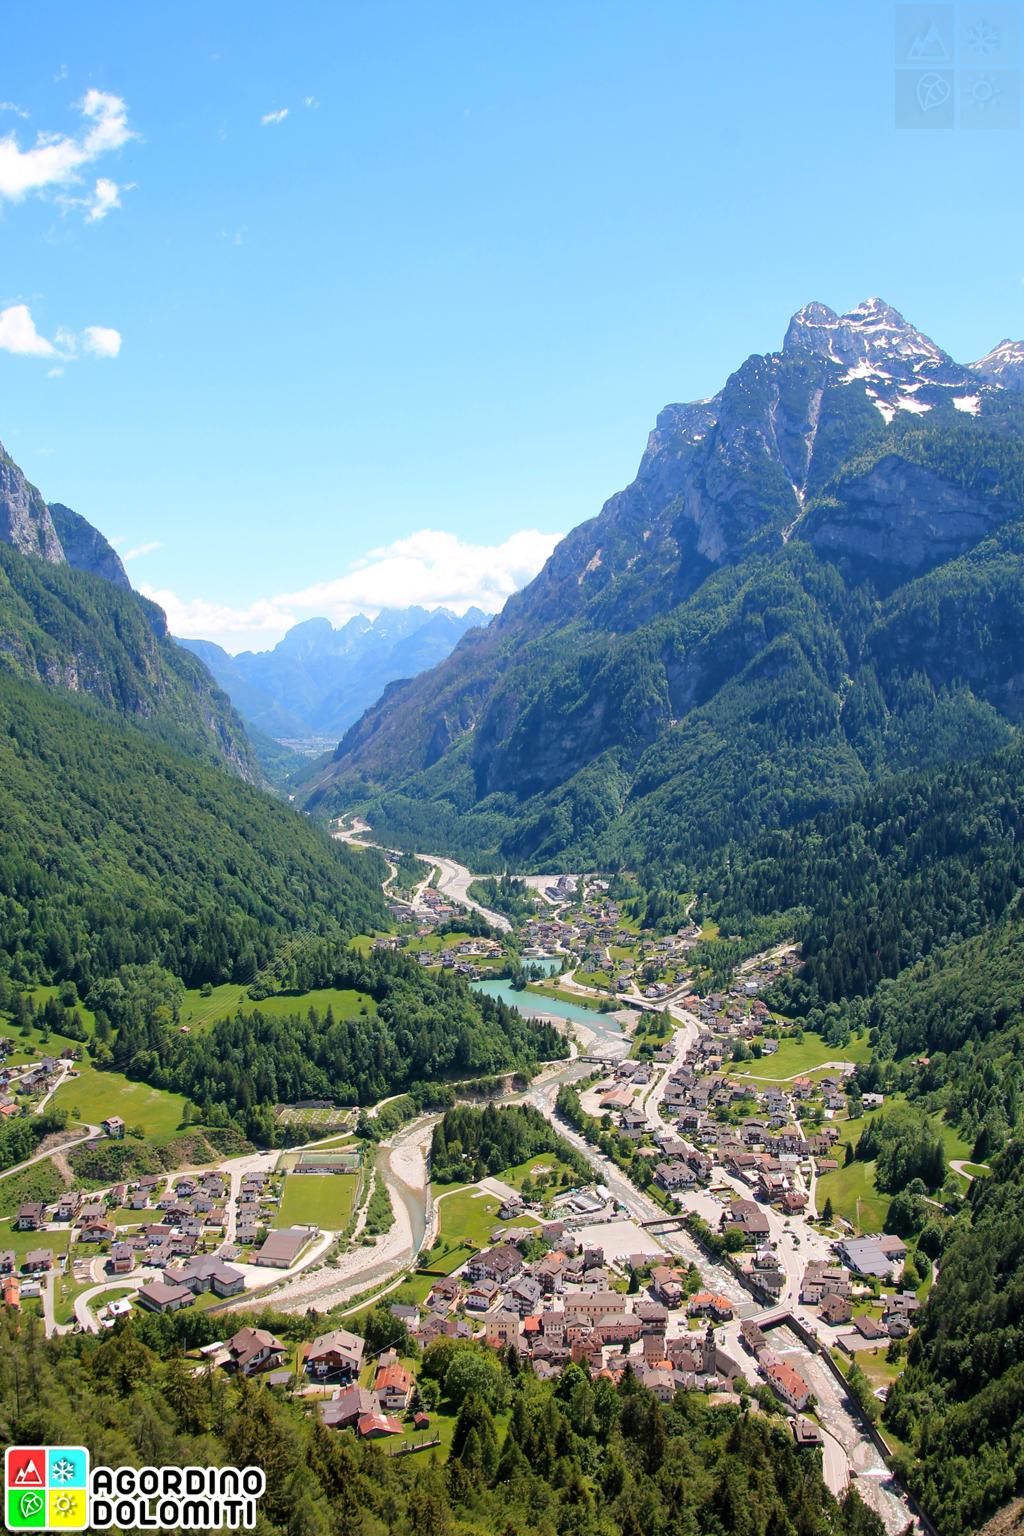 Cencenighe Agordino Dolomiti